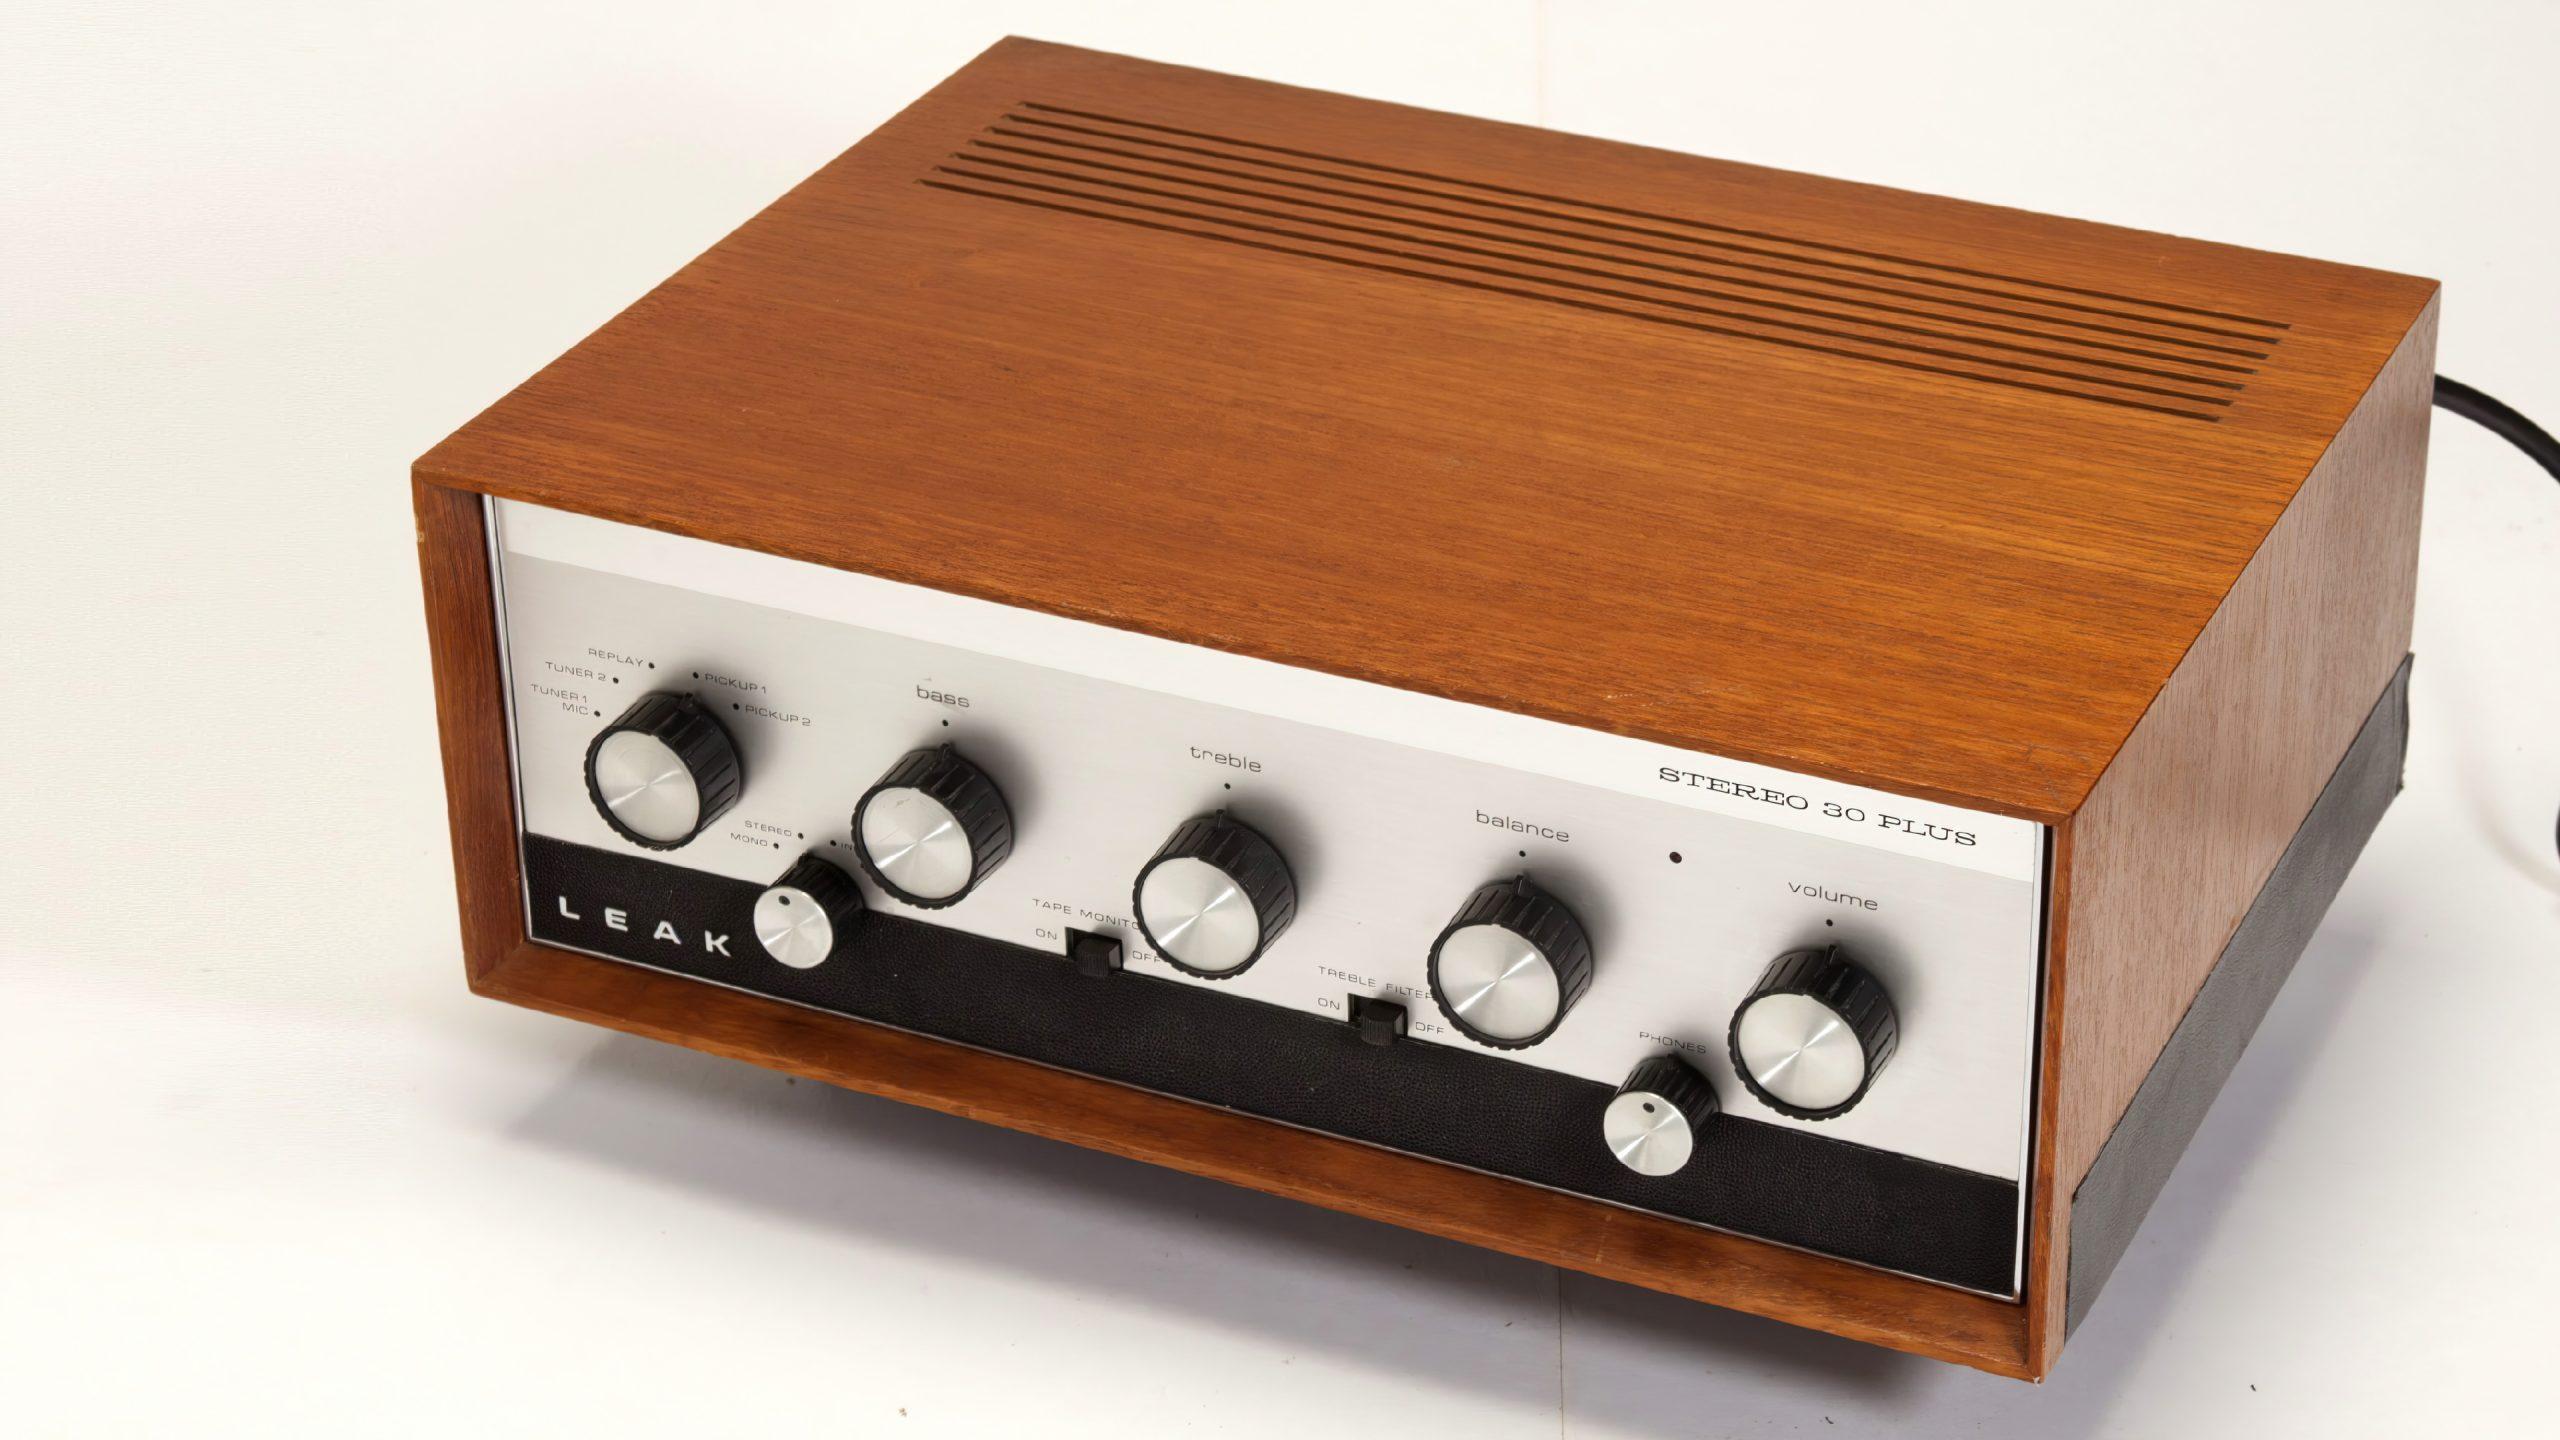 LEAK Stereo 30 Plus